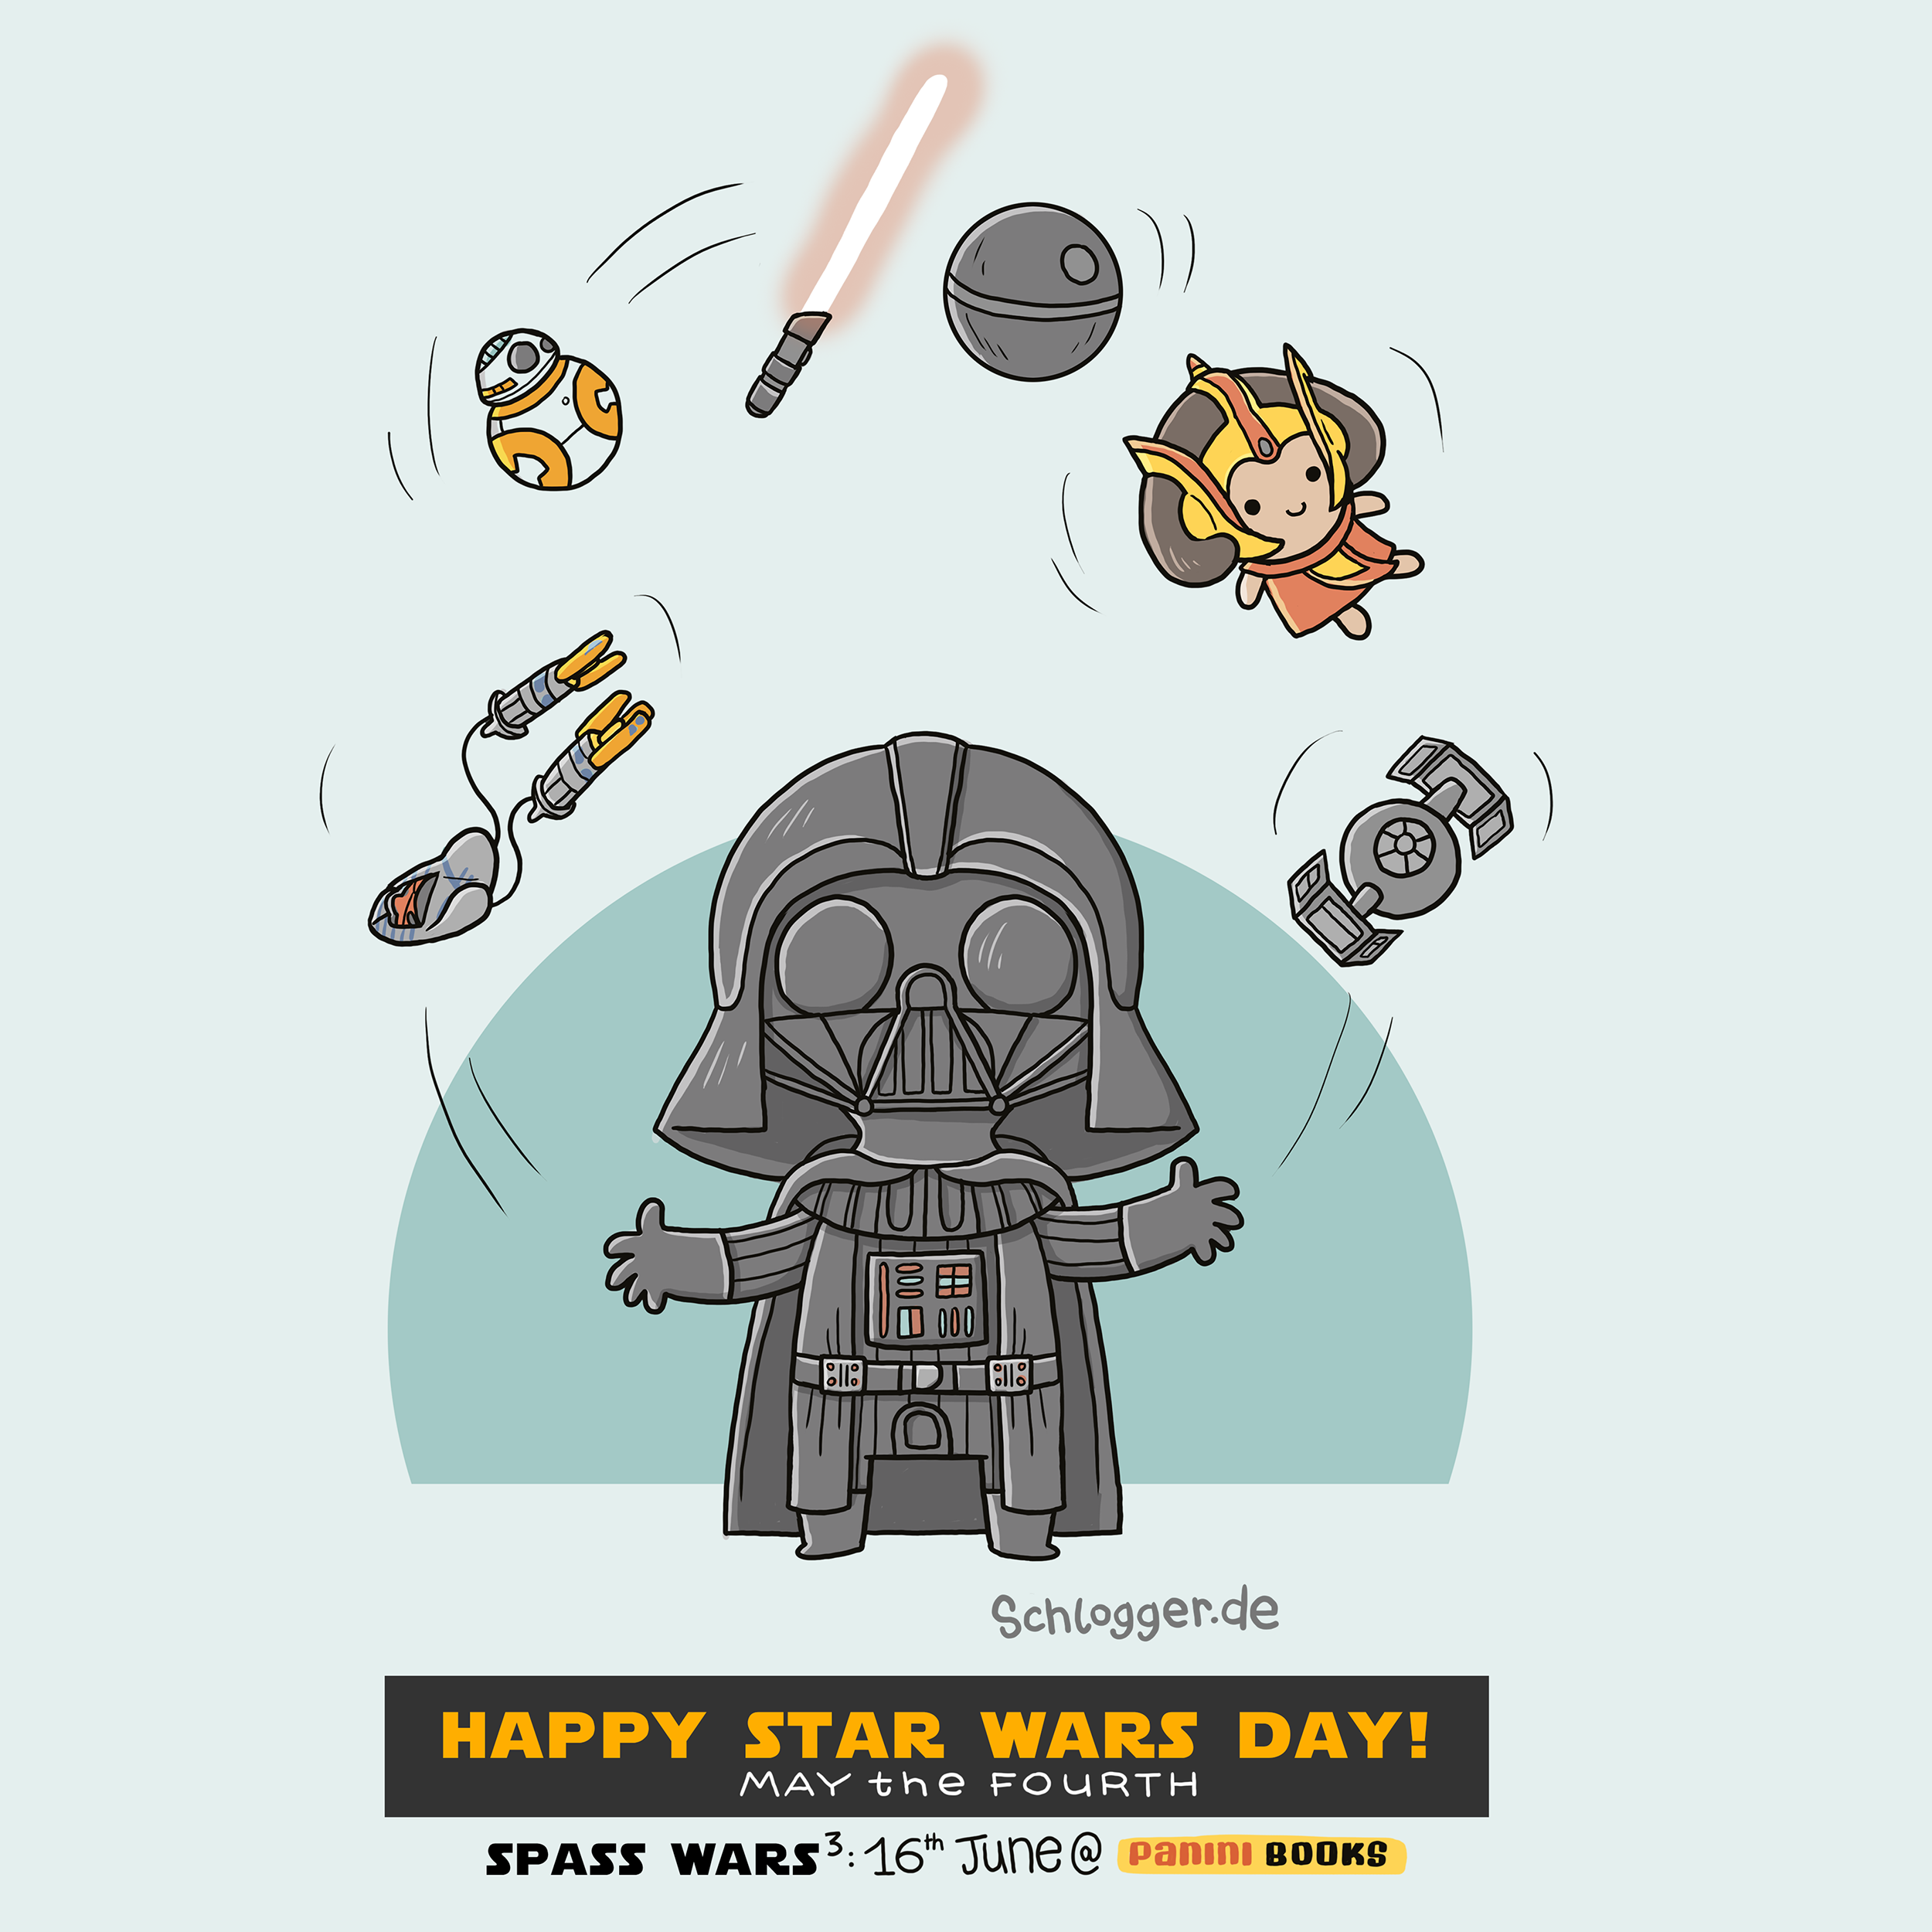 Happy Star Wars Day 2015